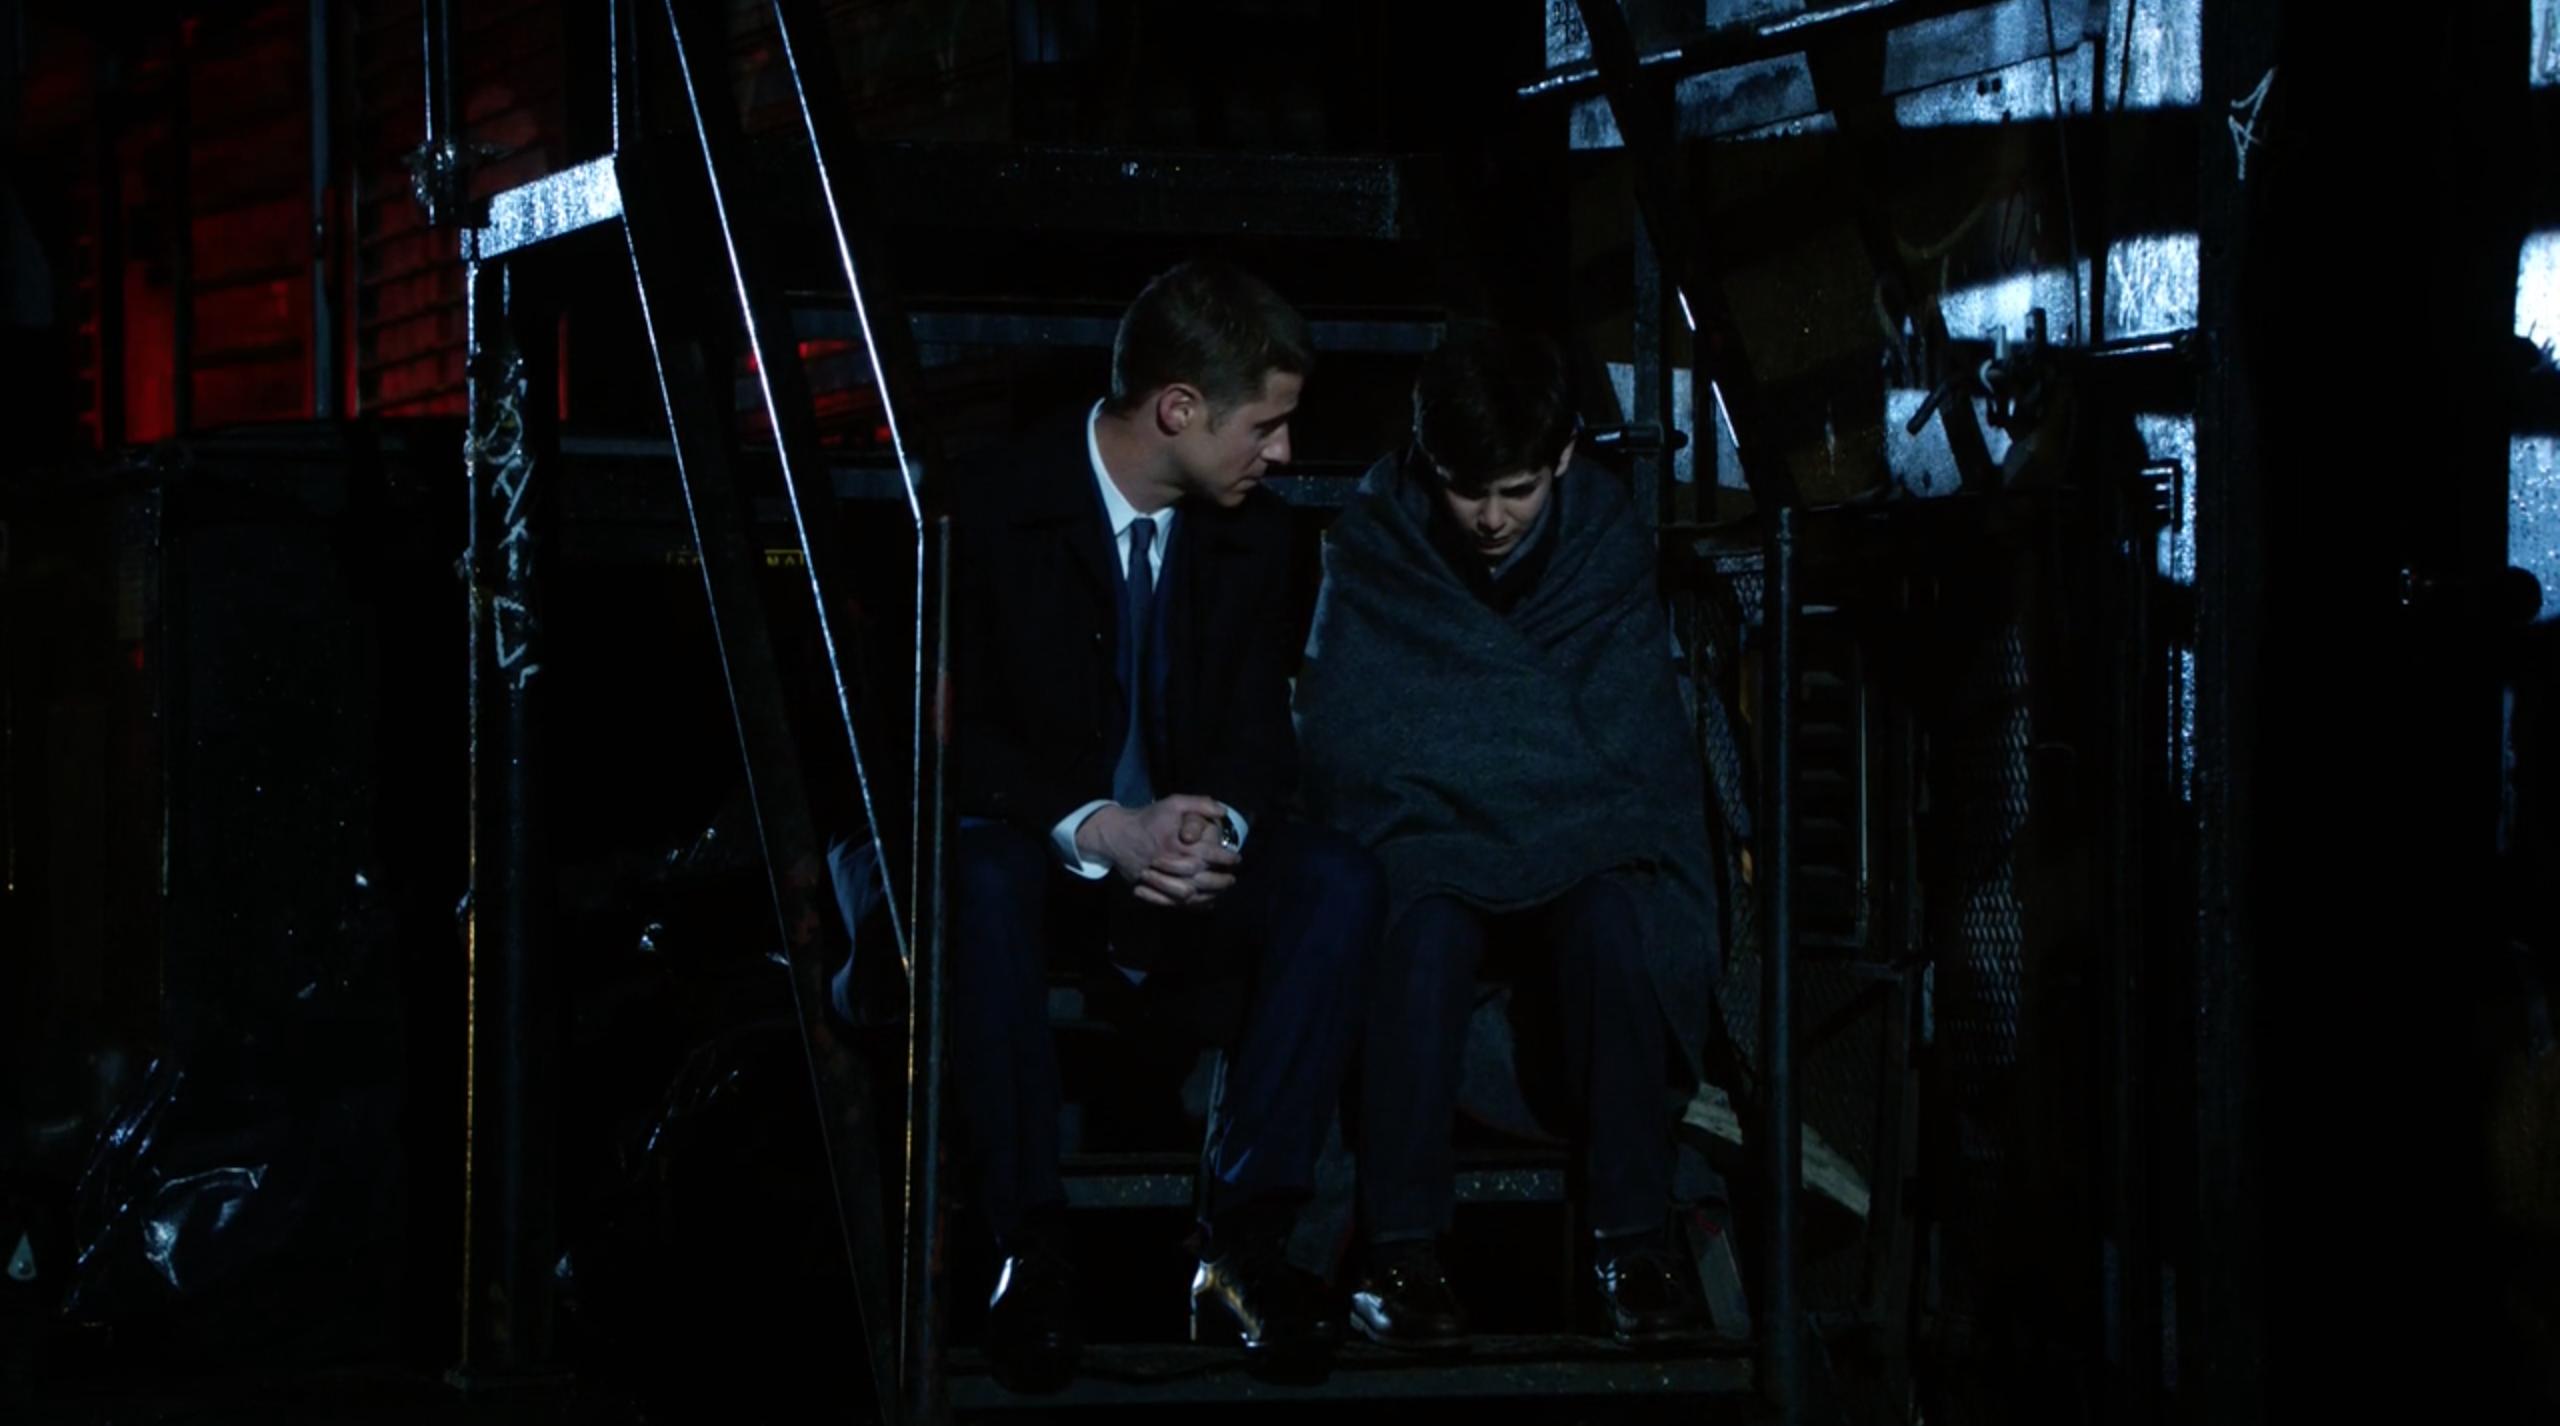 Ben McKenzie as James Gordon & David Mazouz as Bruce Wayne on Fox's 'Gotham'